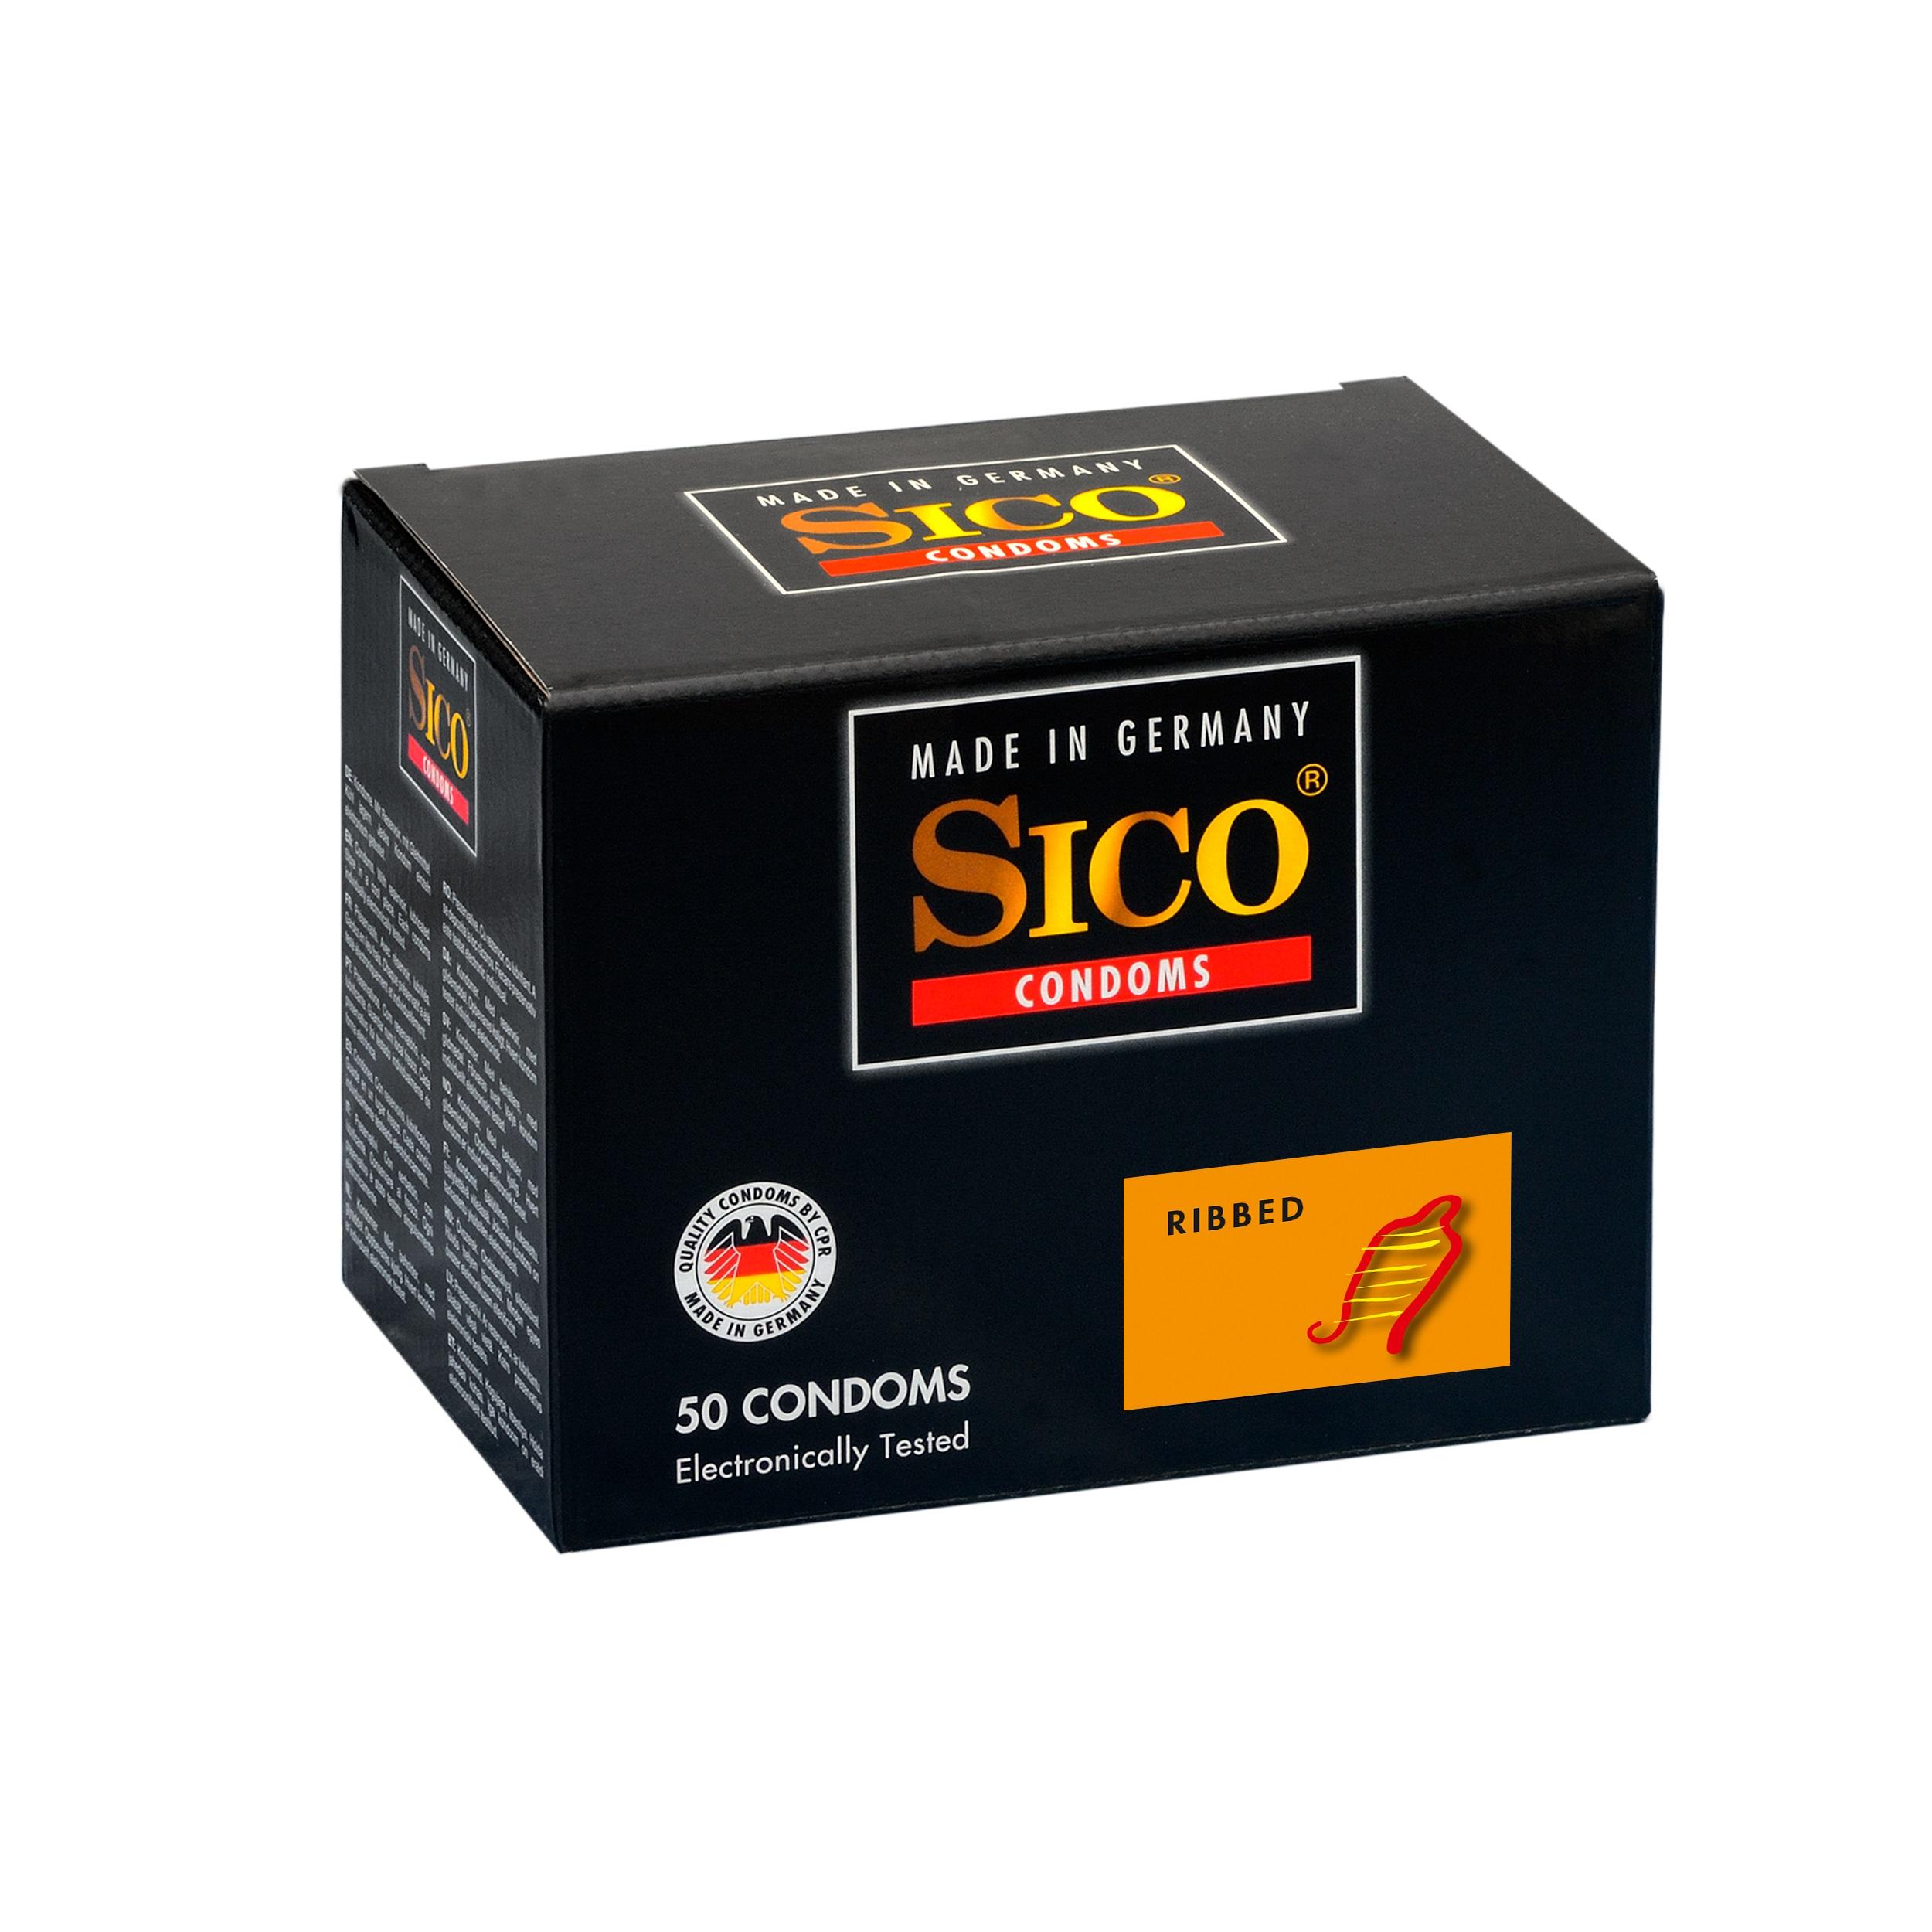 Frei Haus: 50 SICO Kondome verschiedene Sorten Condome 50 SICO Ribbed Kondome